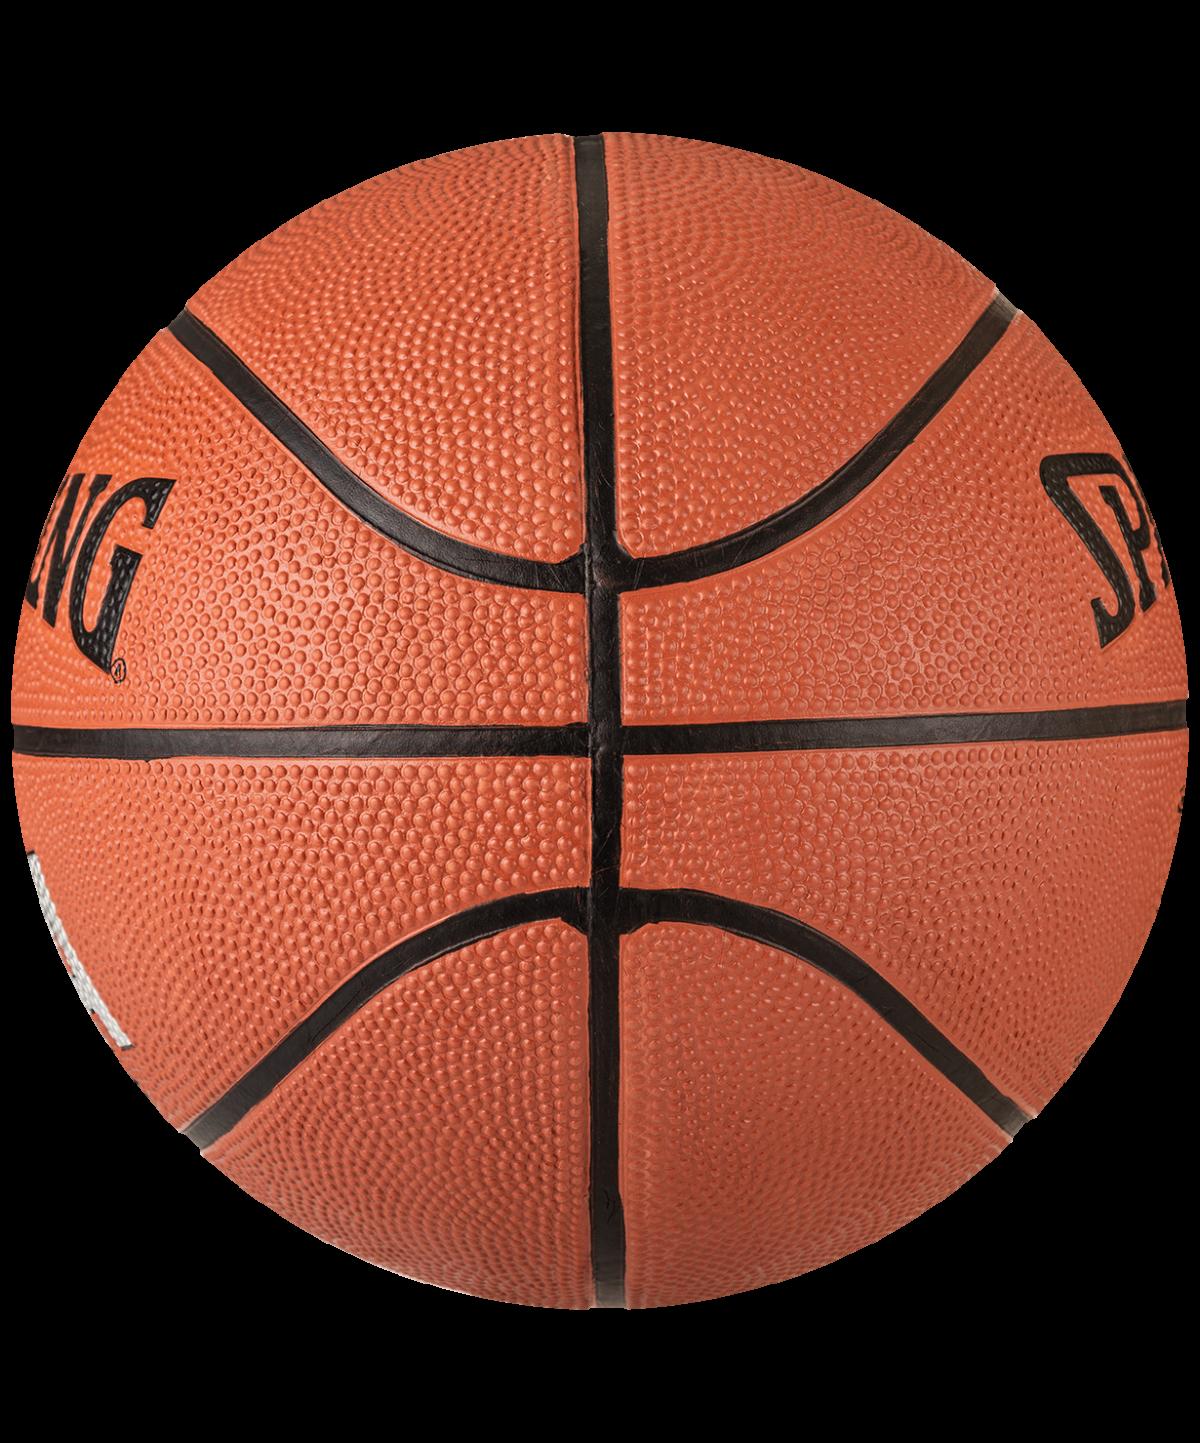 SPALDING NBA Silver Мяч баскетбольный  83014Z №5 - 3